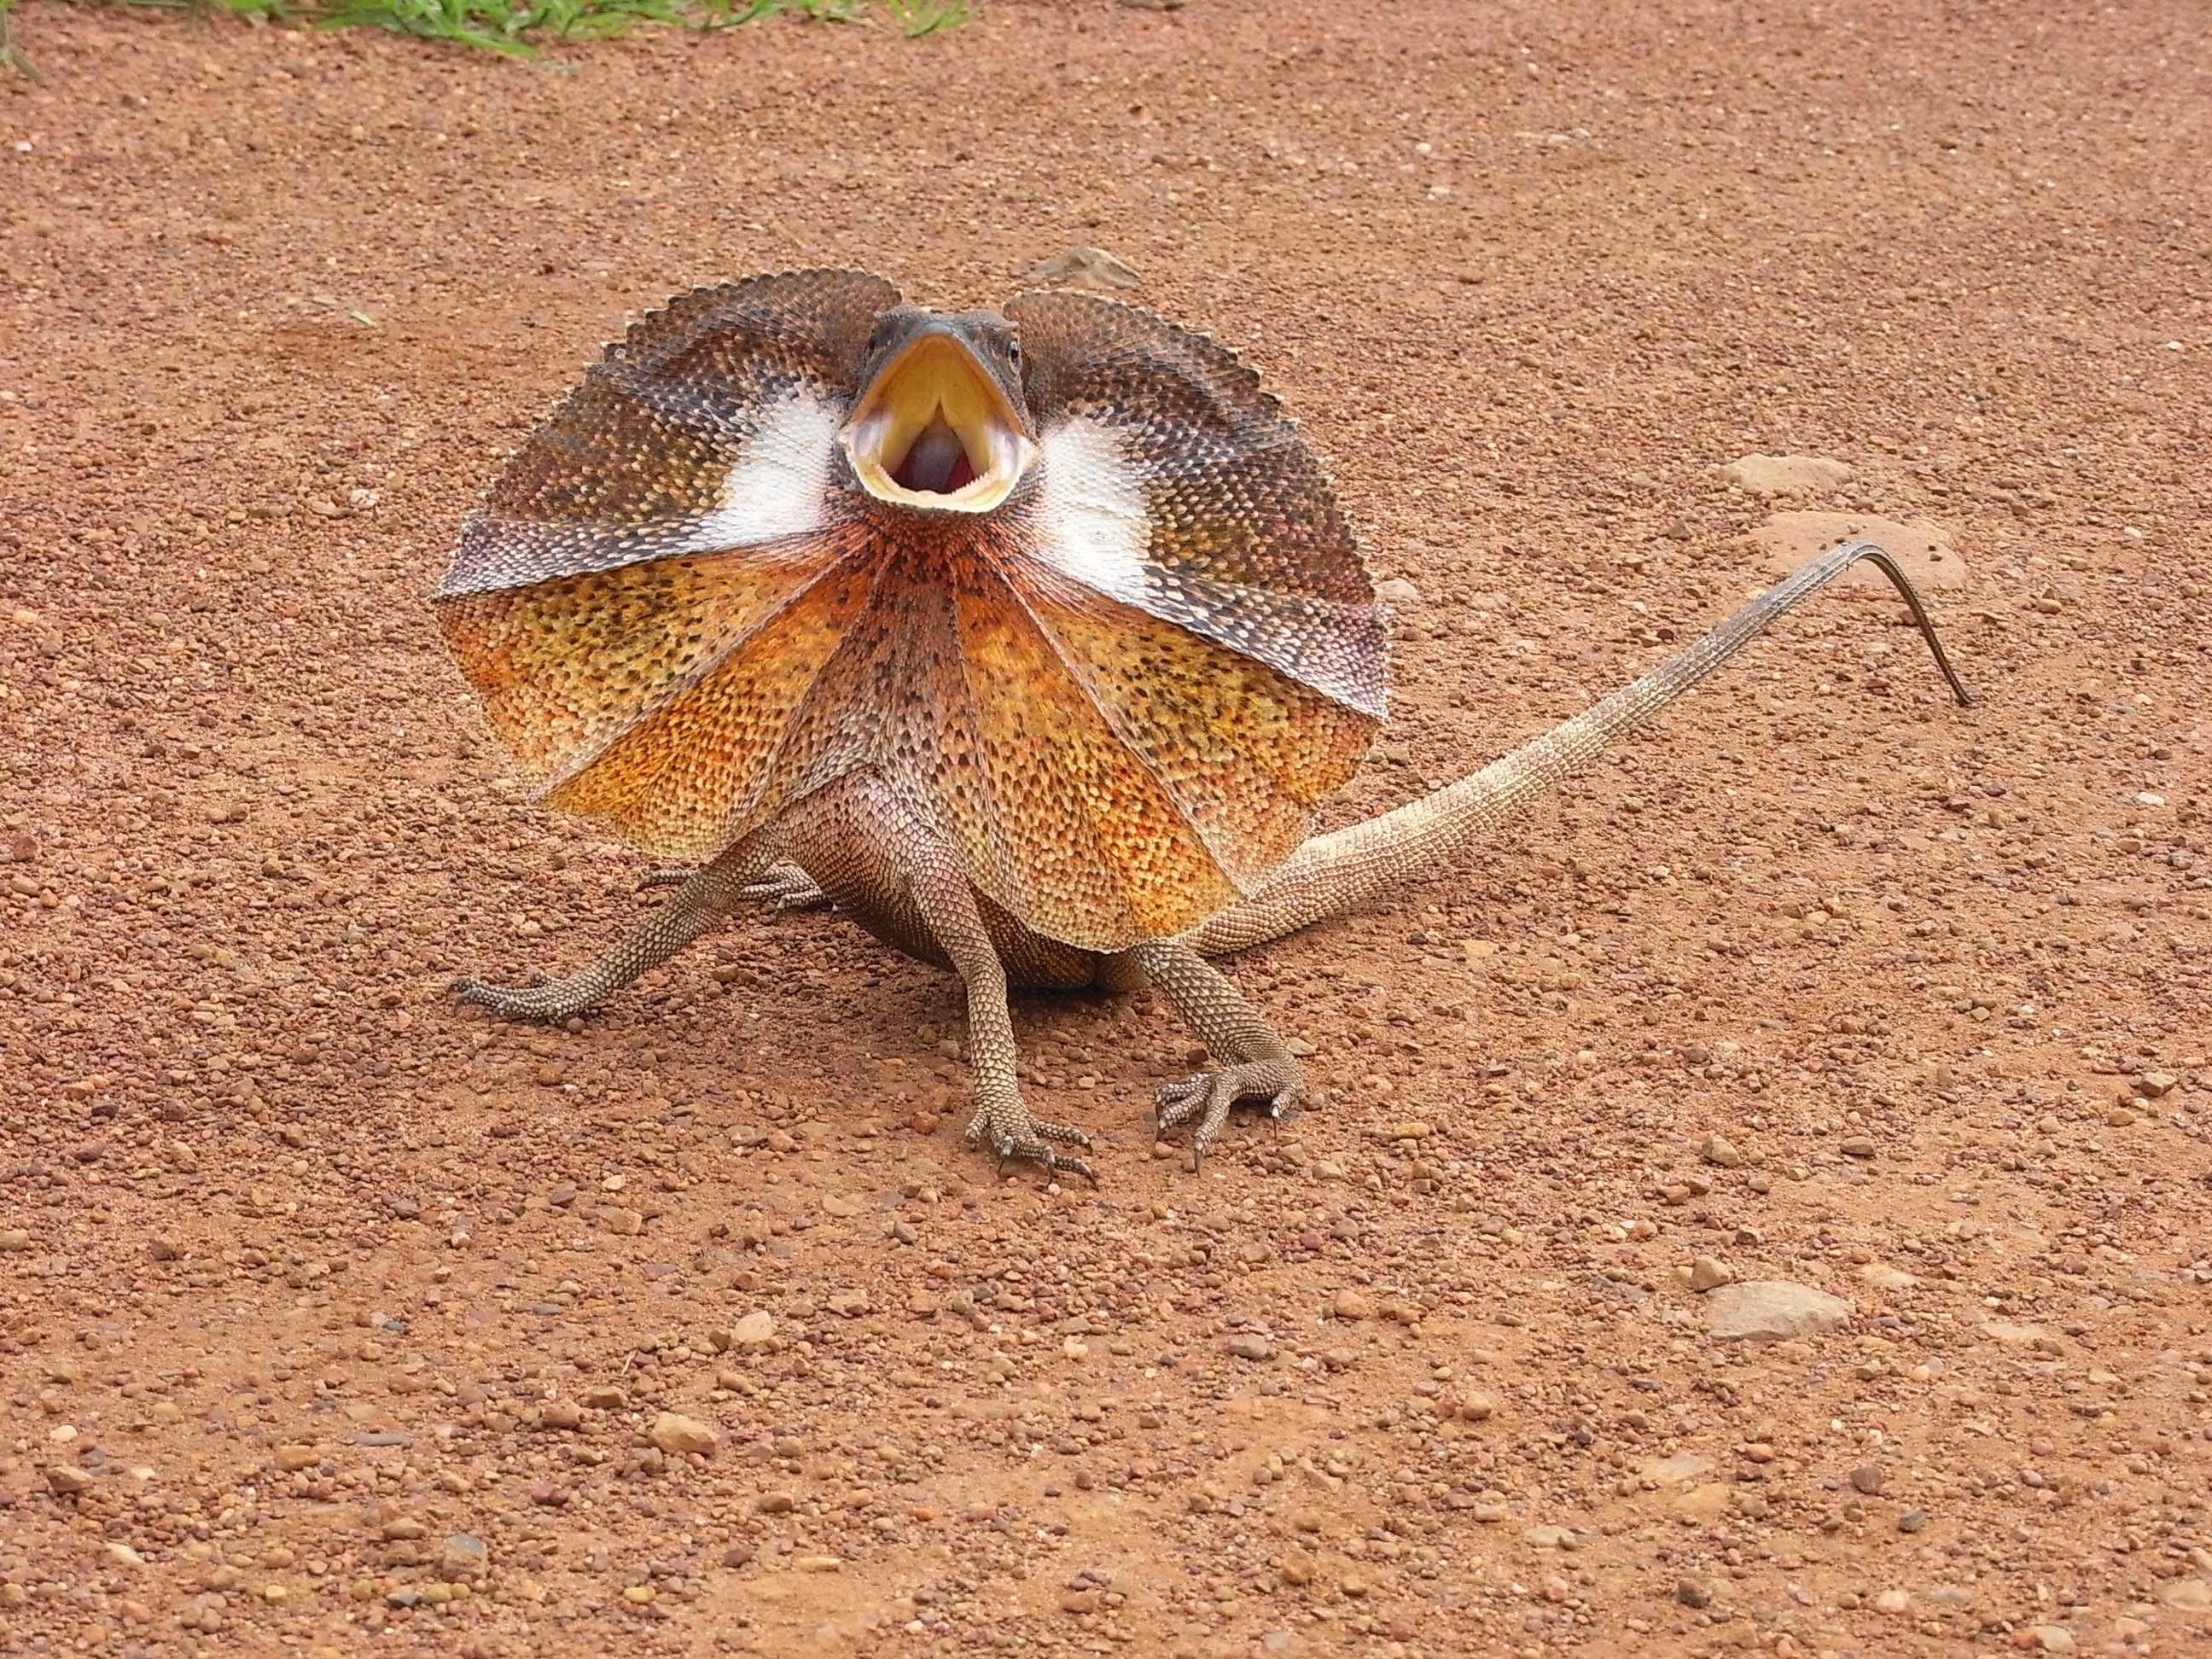 Frill-necked lizard, Australia, Dragon, Dry, Lizard, HQ Photo